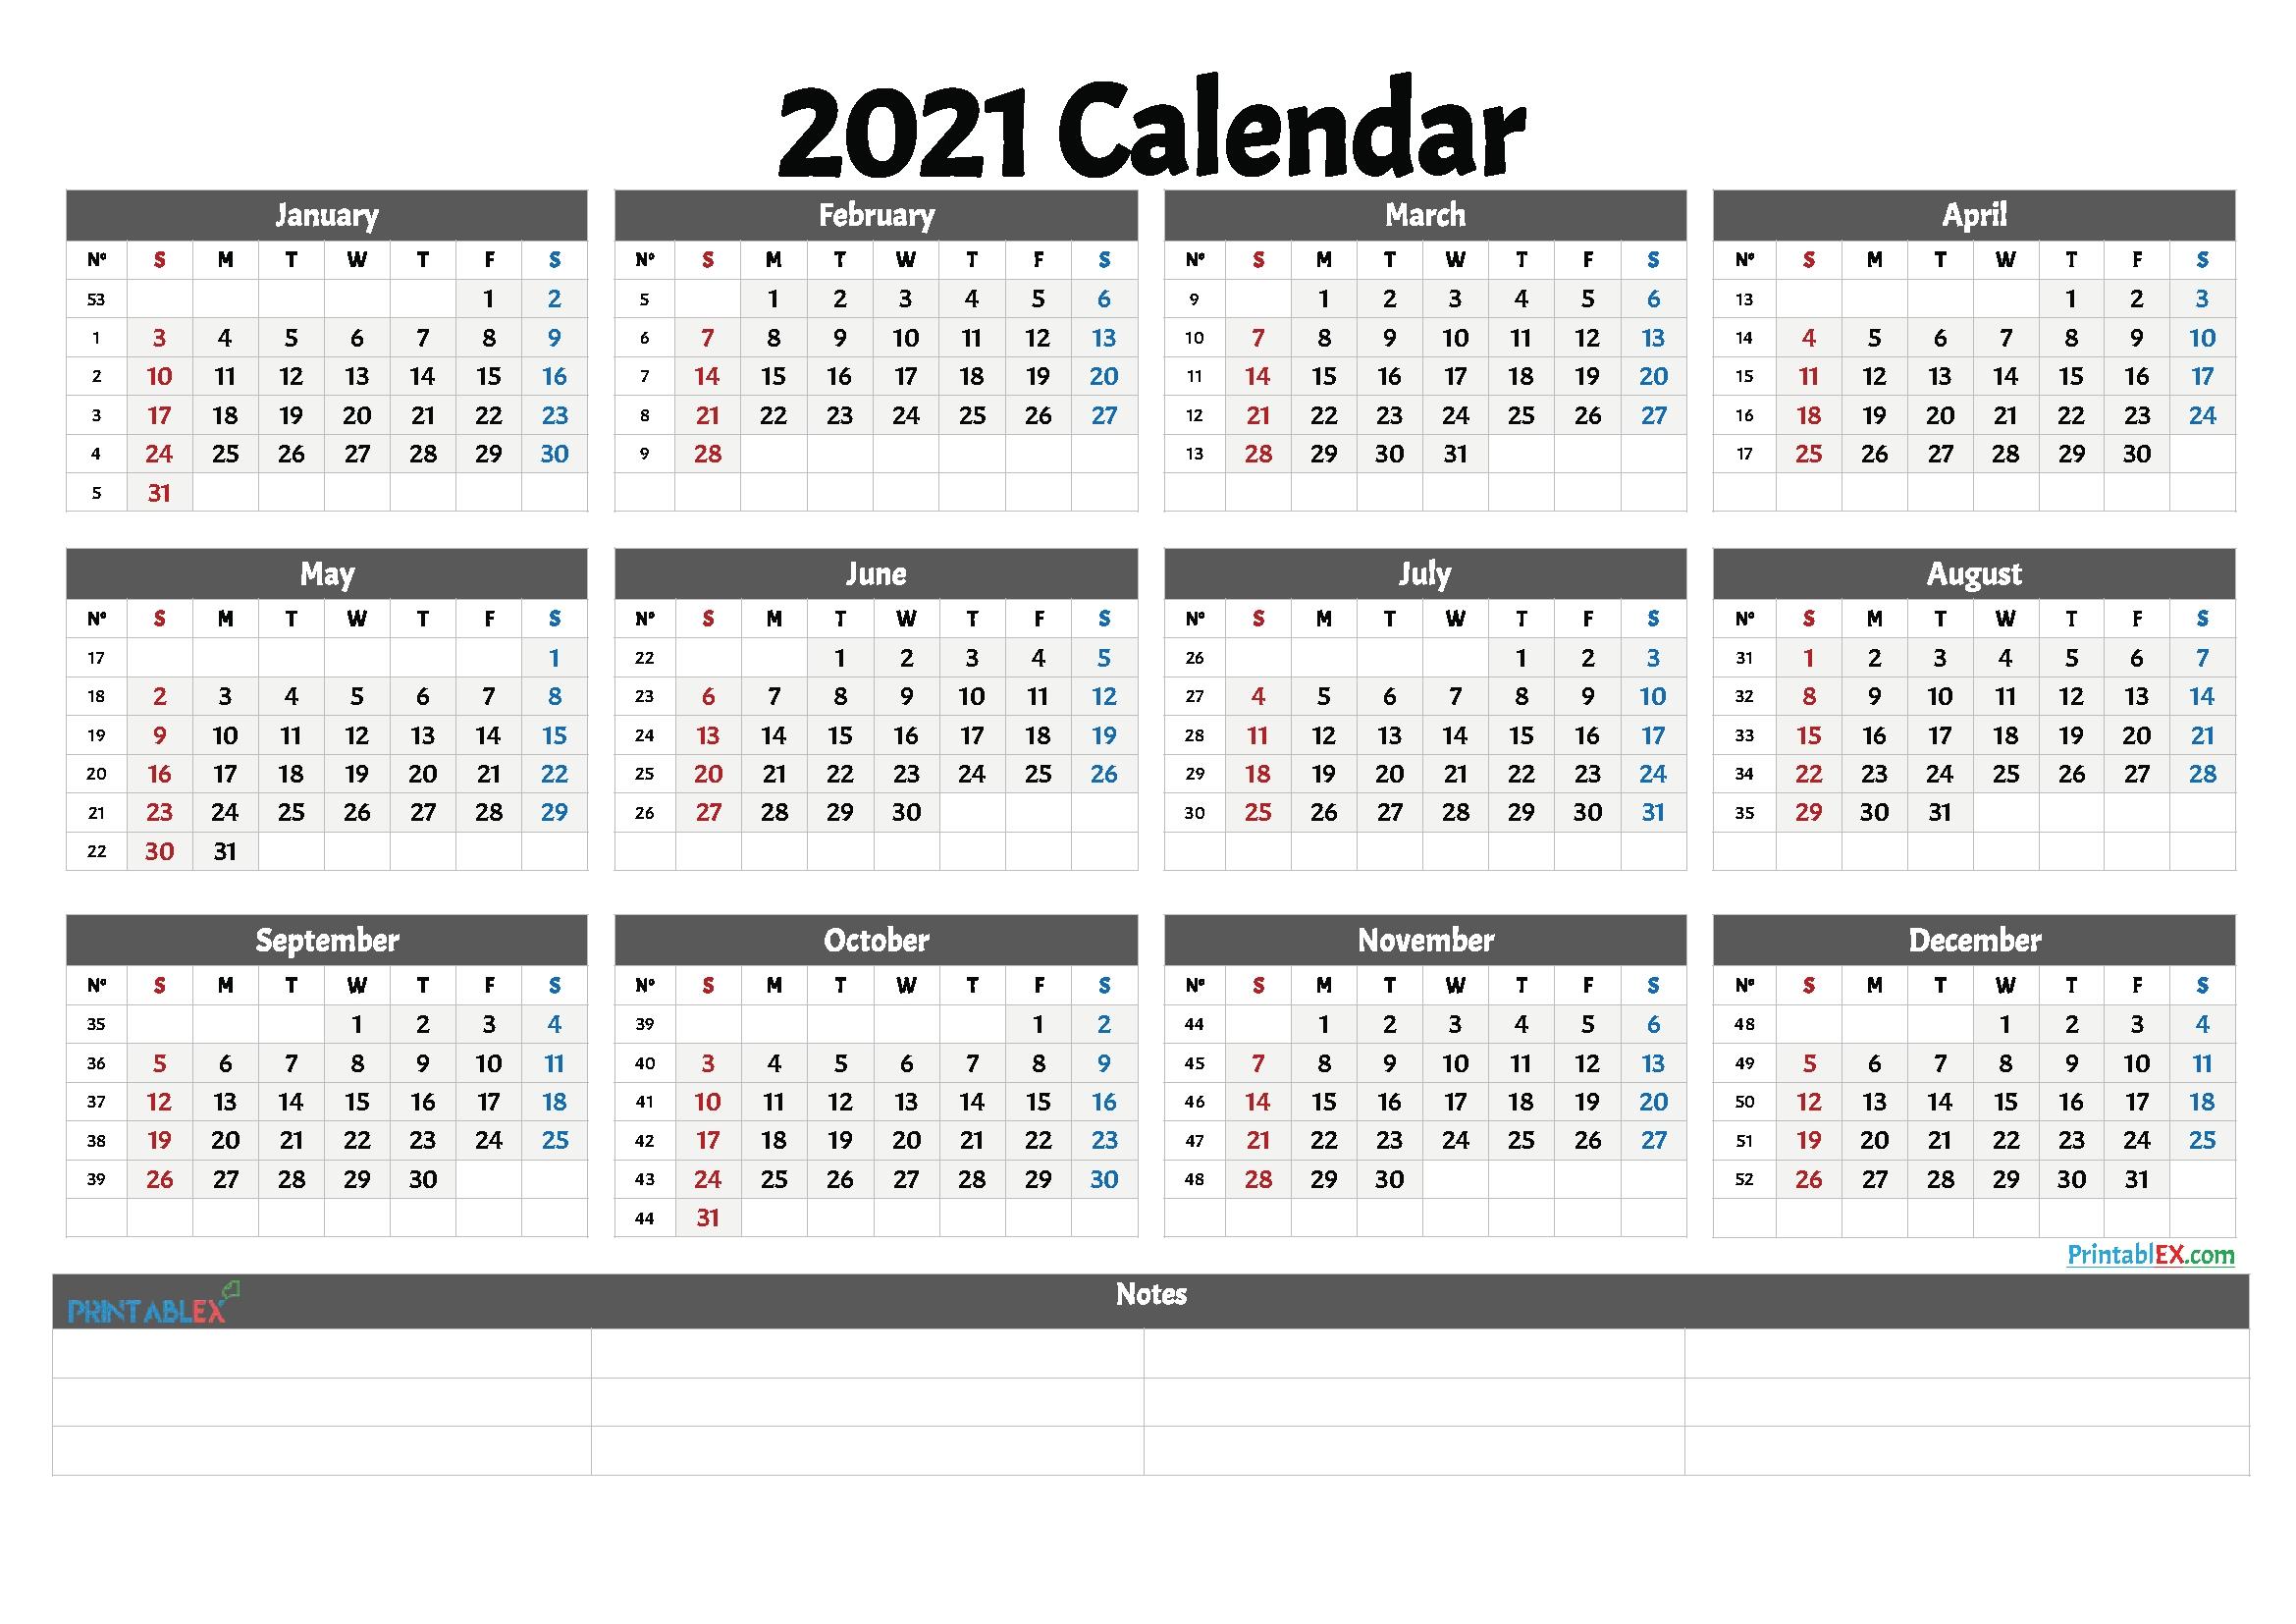 2021 free printable yearly calendar with week numbers in